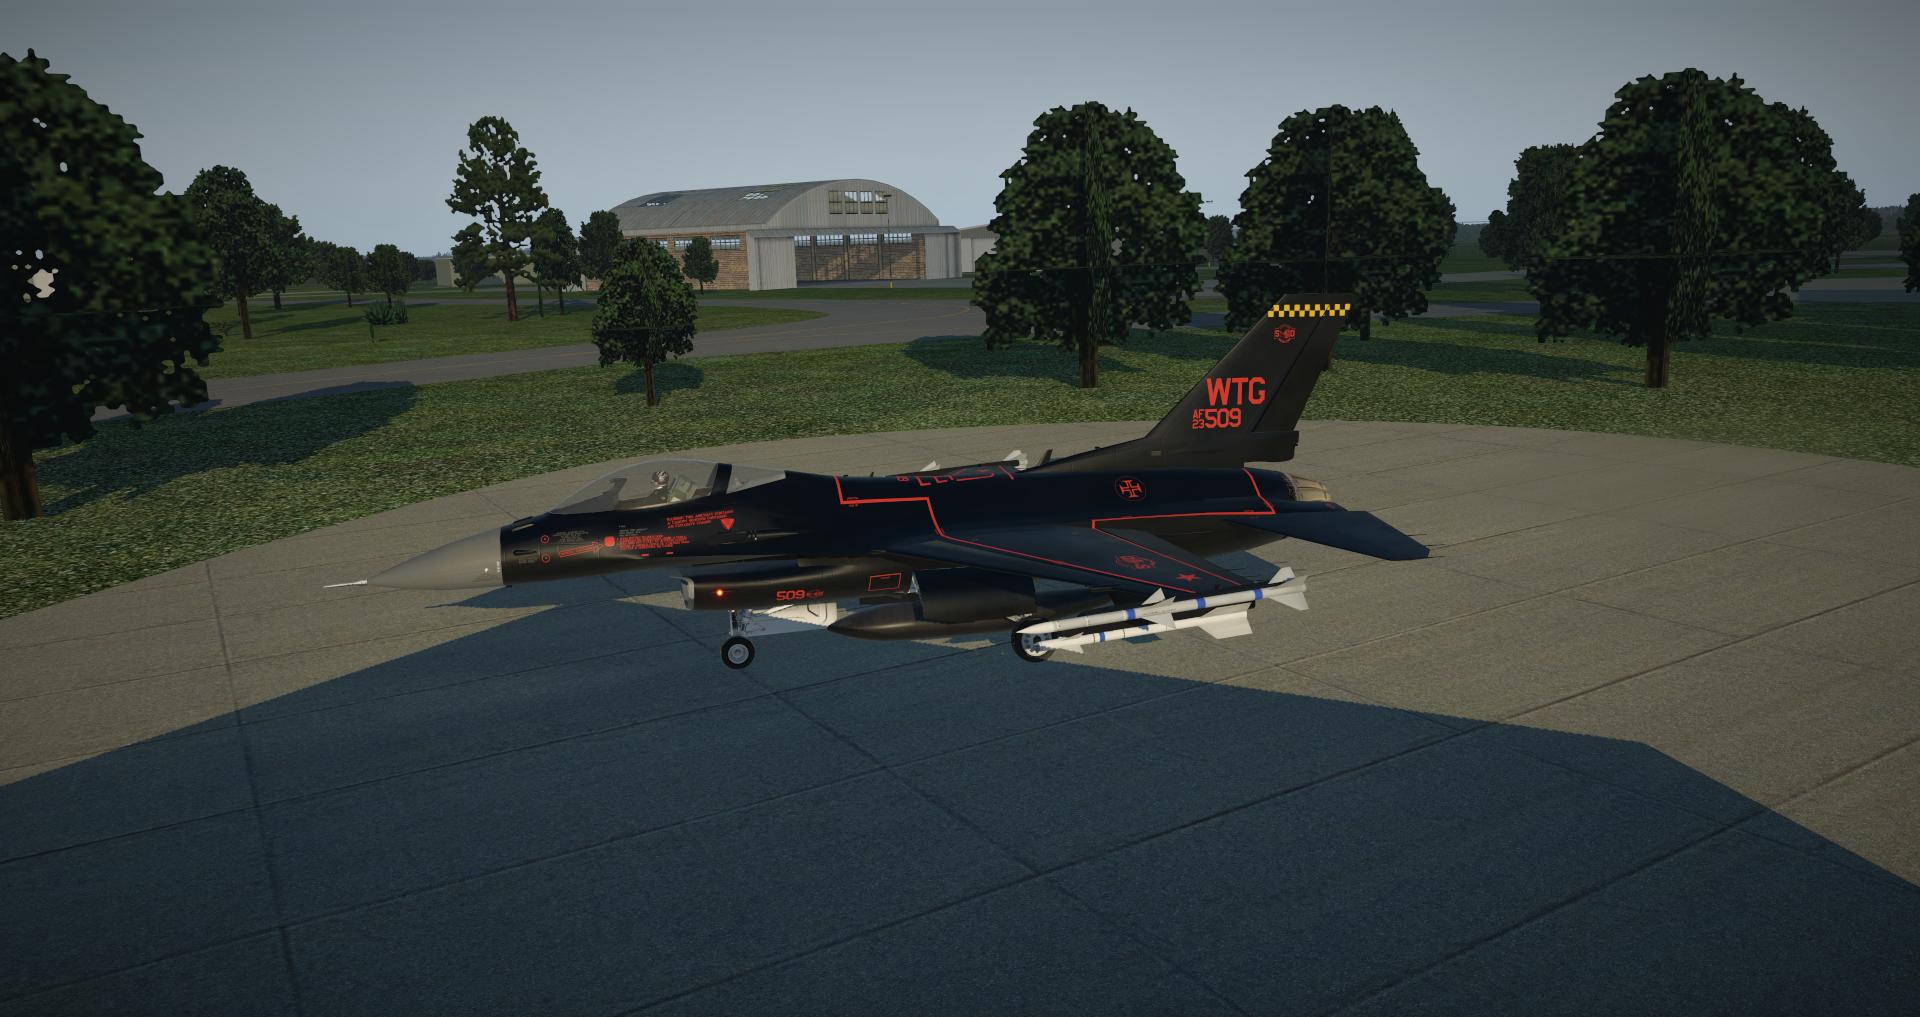 F_16 - 2021-01-22 10.56.39